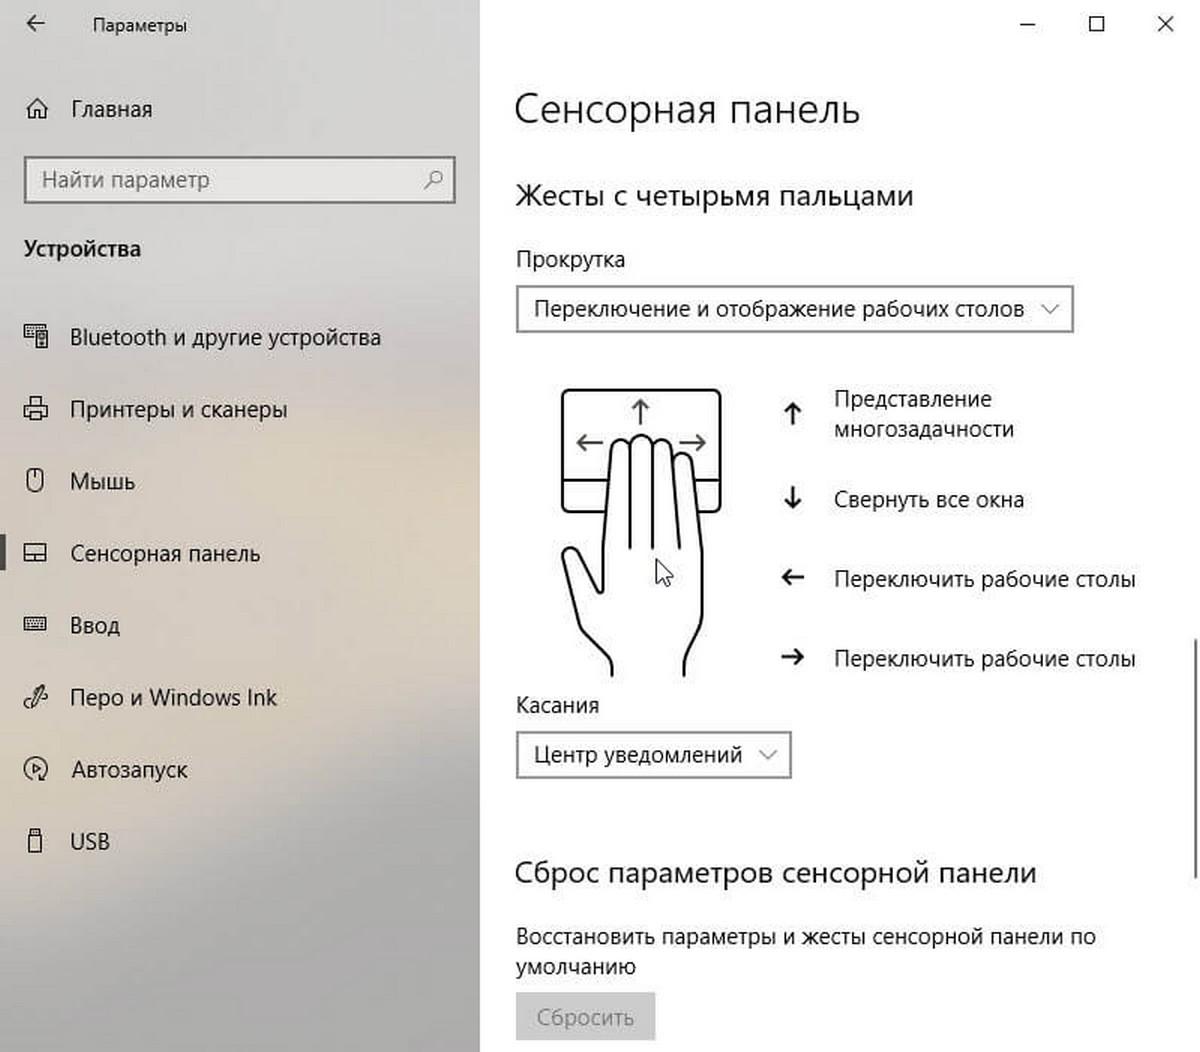 жесты тачпада для Windows 10